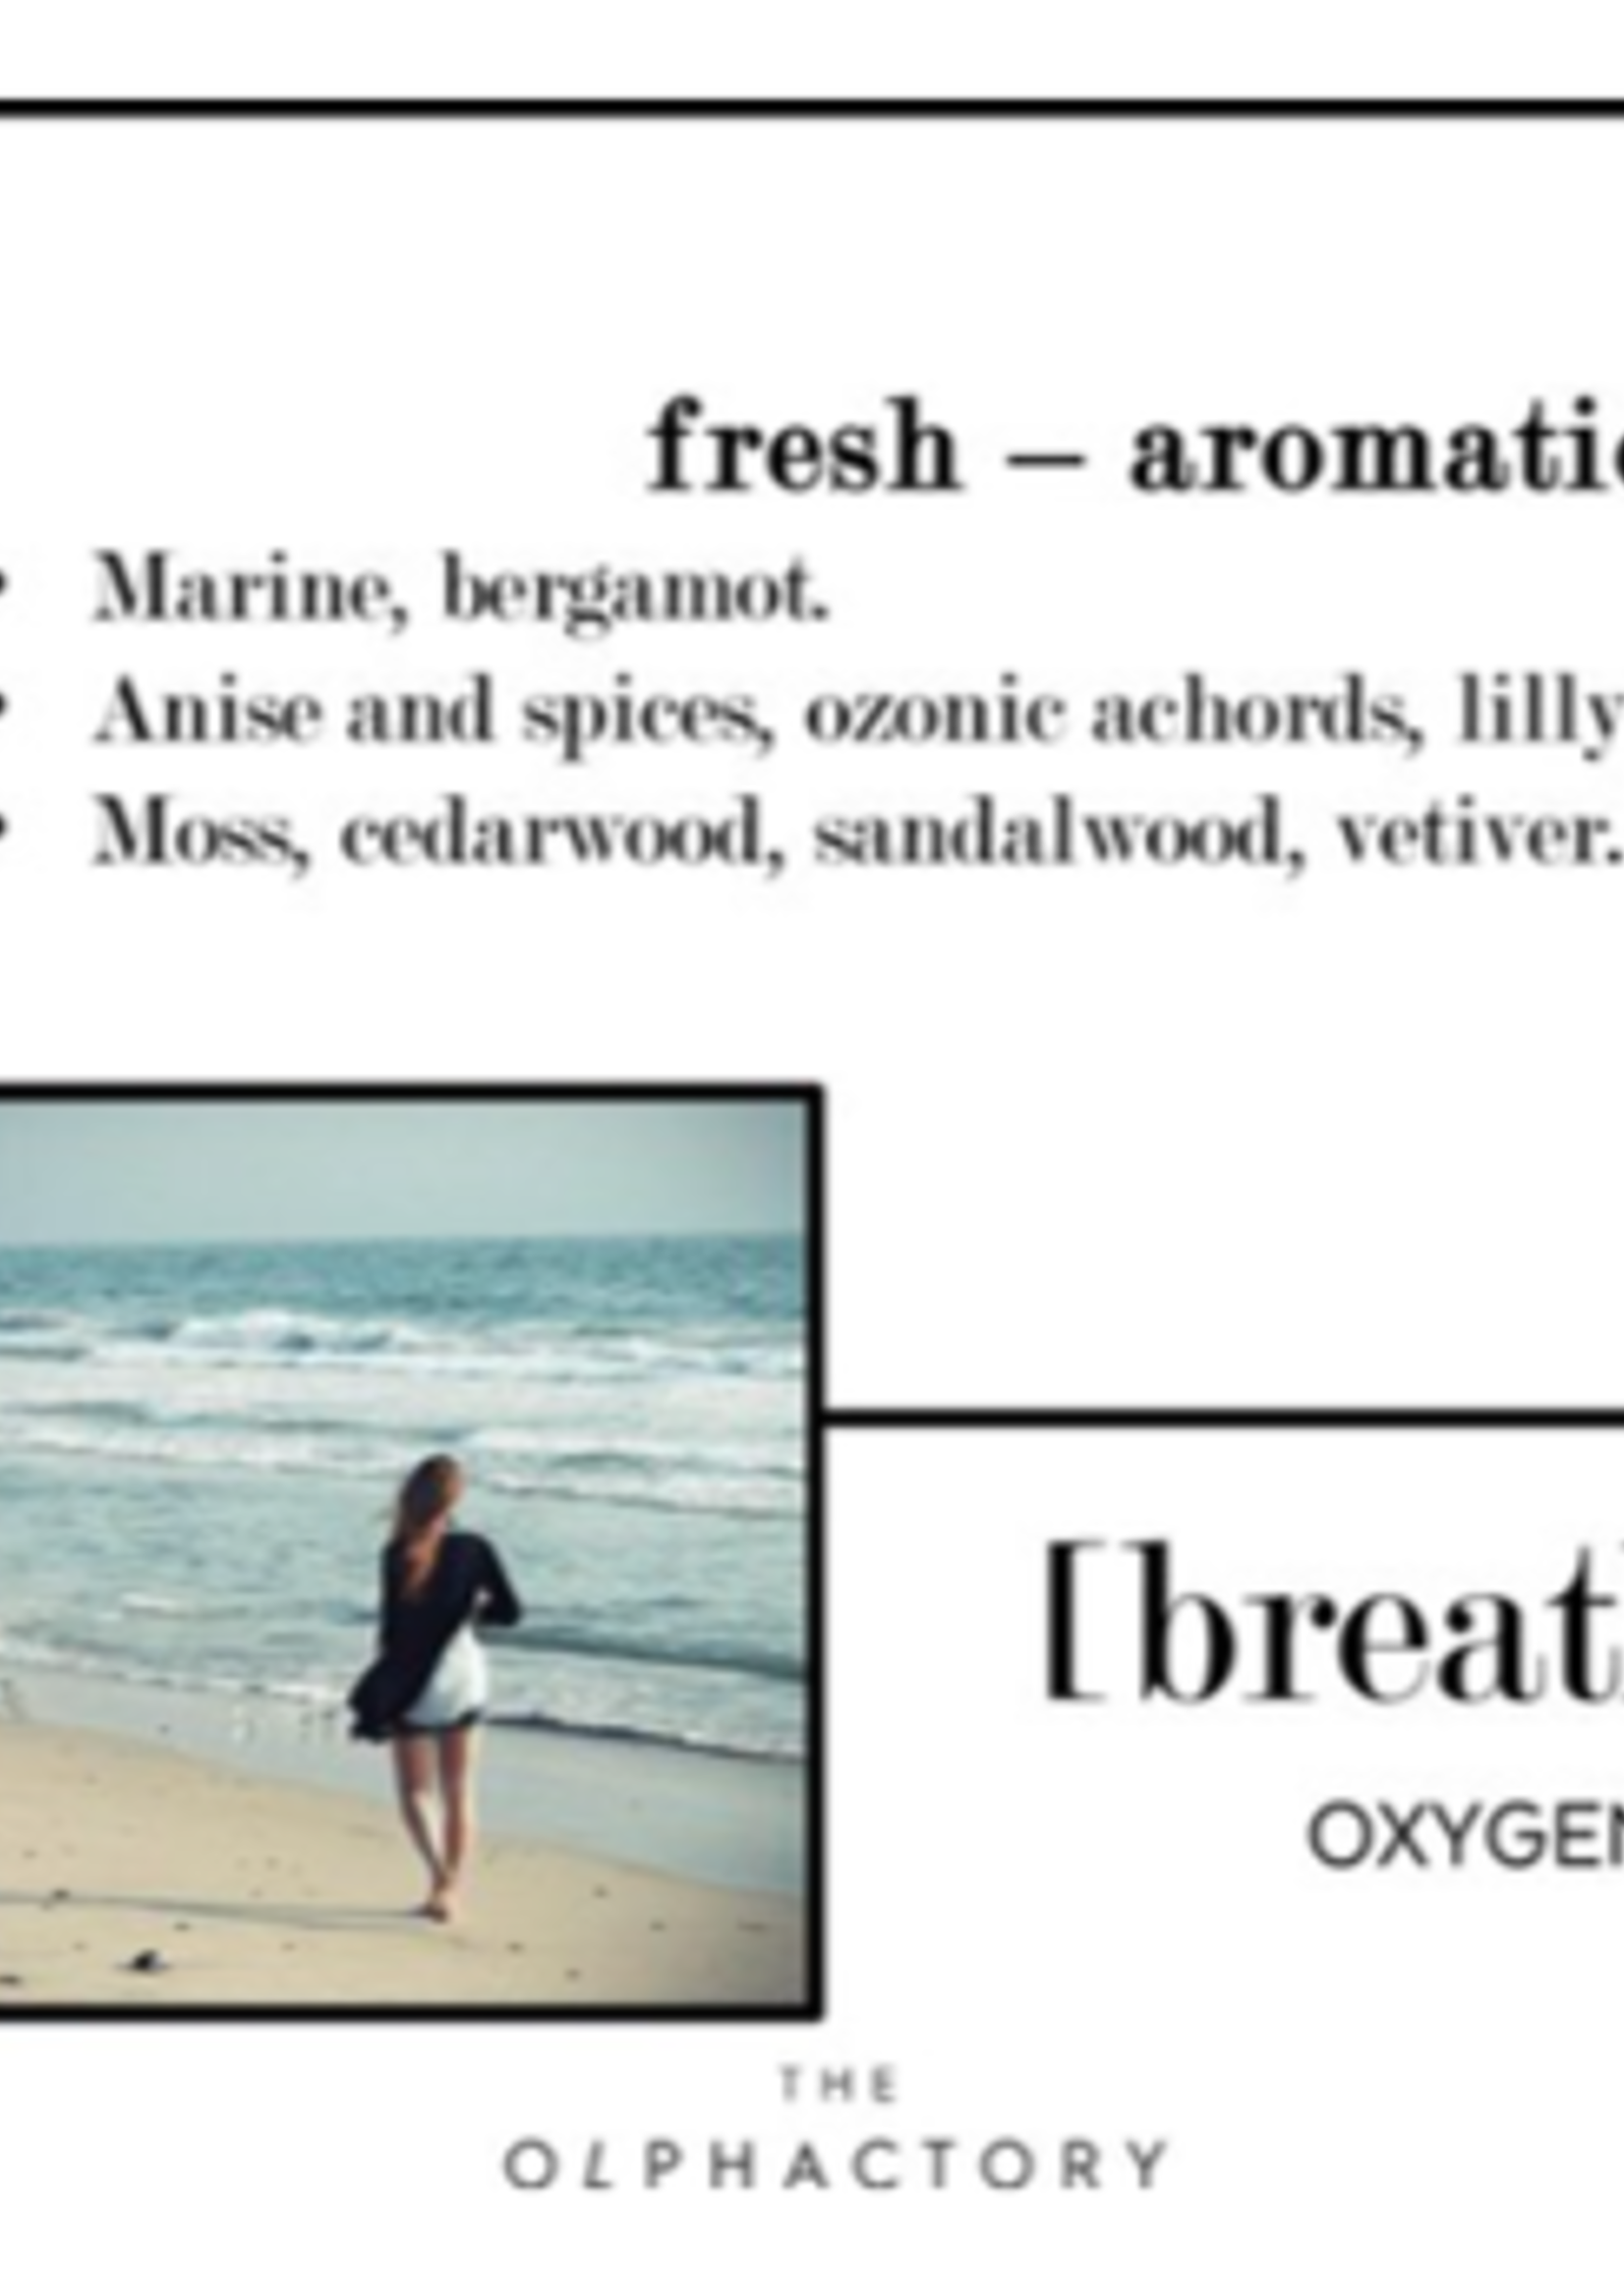 The Olphactory The Olphactory luxe geurstokken Breathe Oxygen